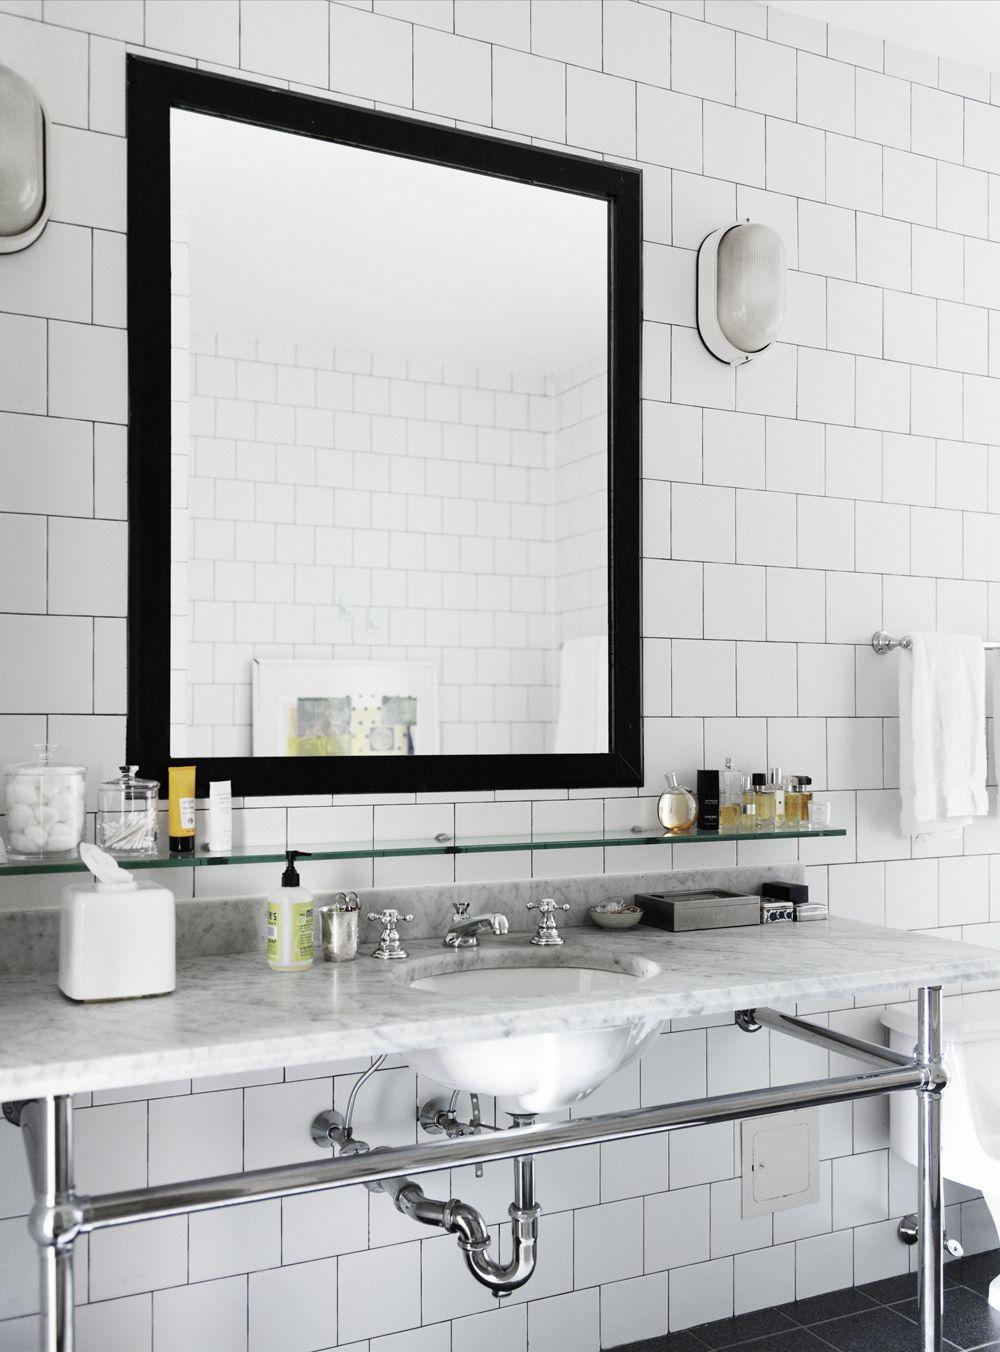 Interiors Brooklyn Loft Vanities Glasses And Glass Shelves